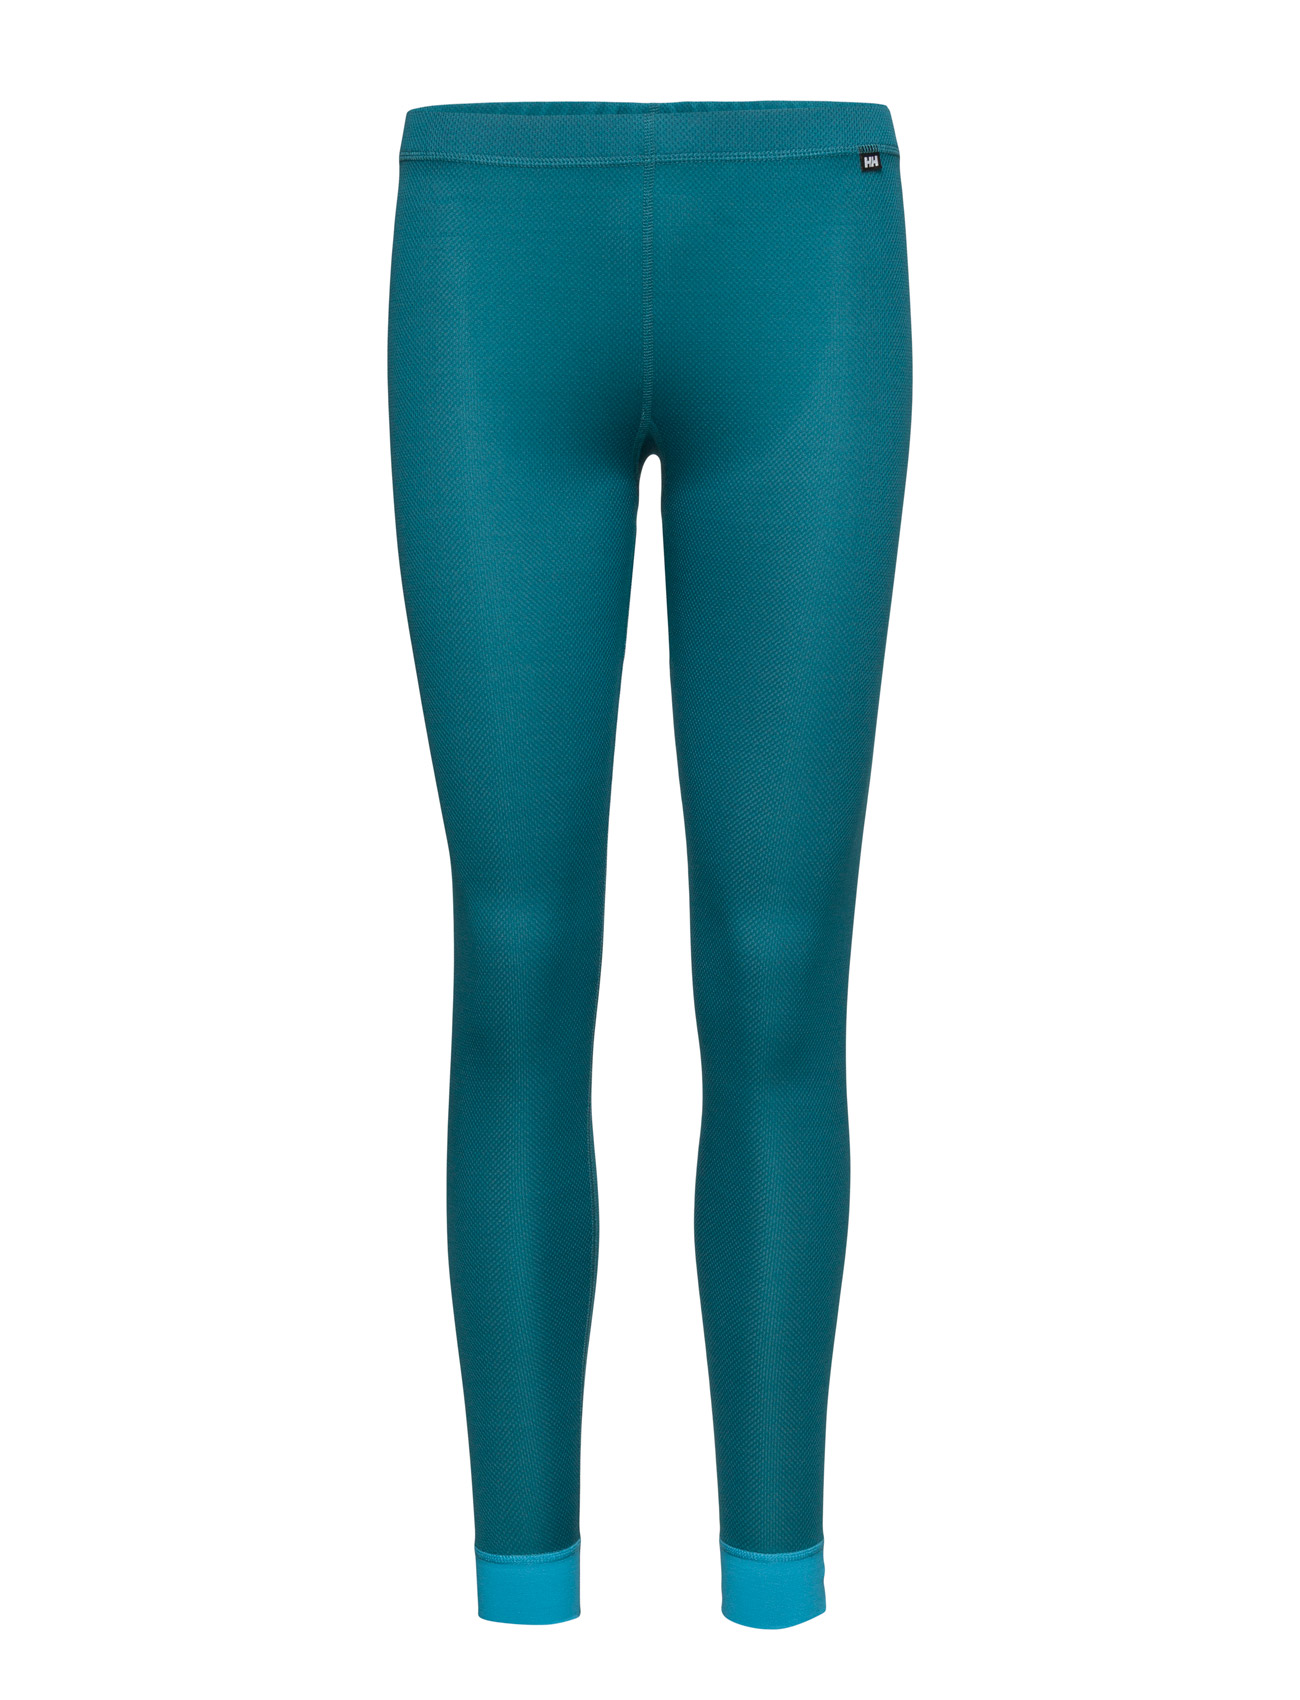 W Hh Dry Pant Helly Hansen Sports undertøj til Kvinder i